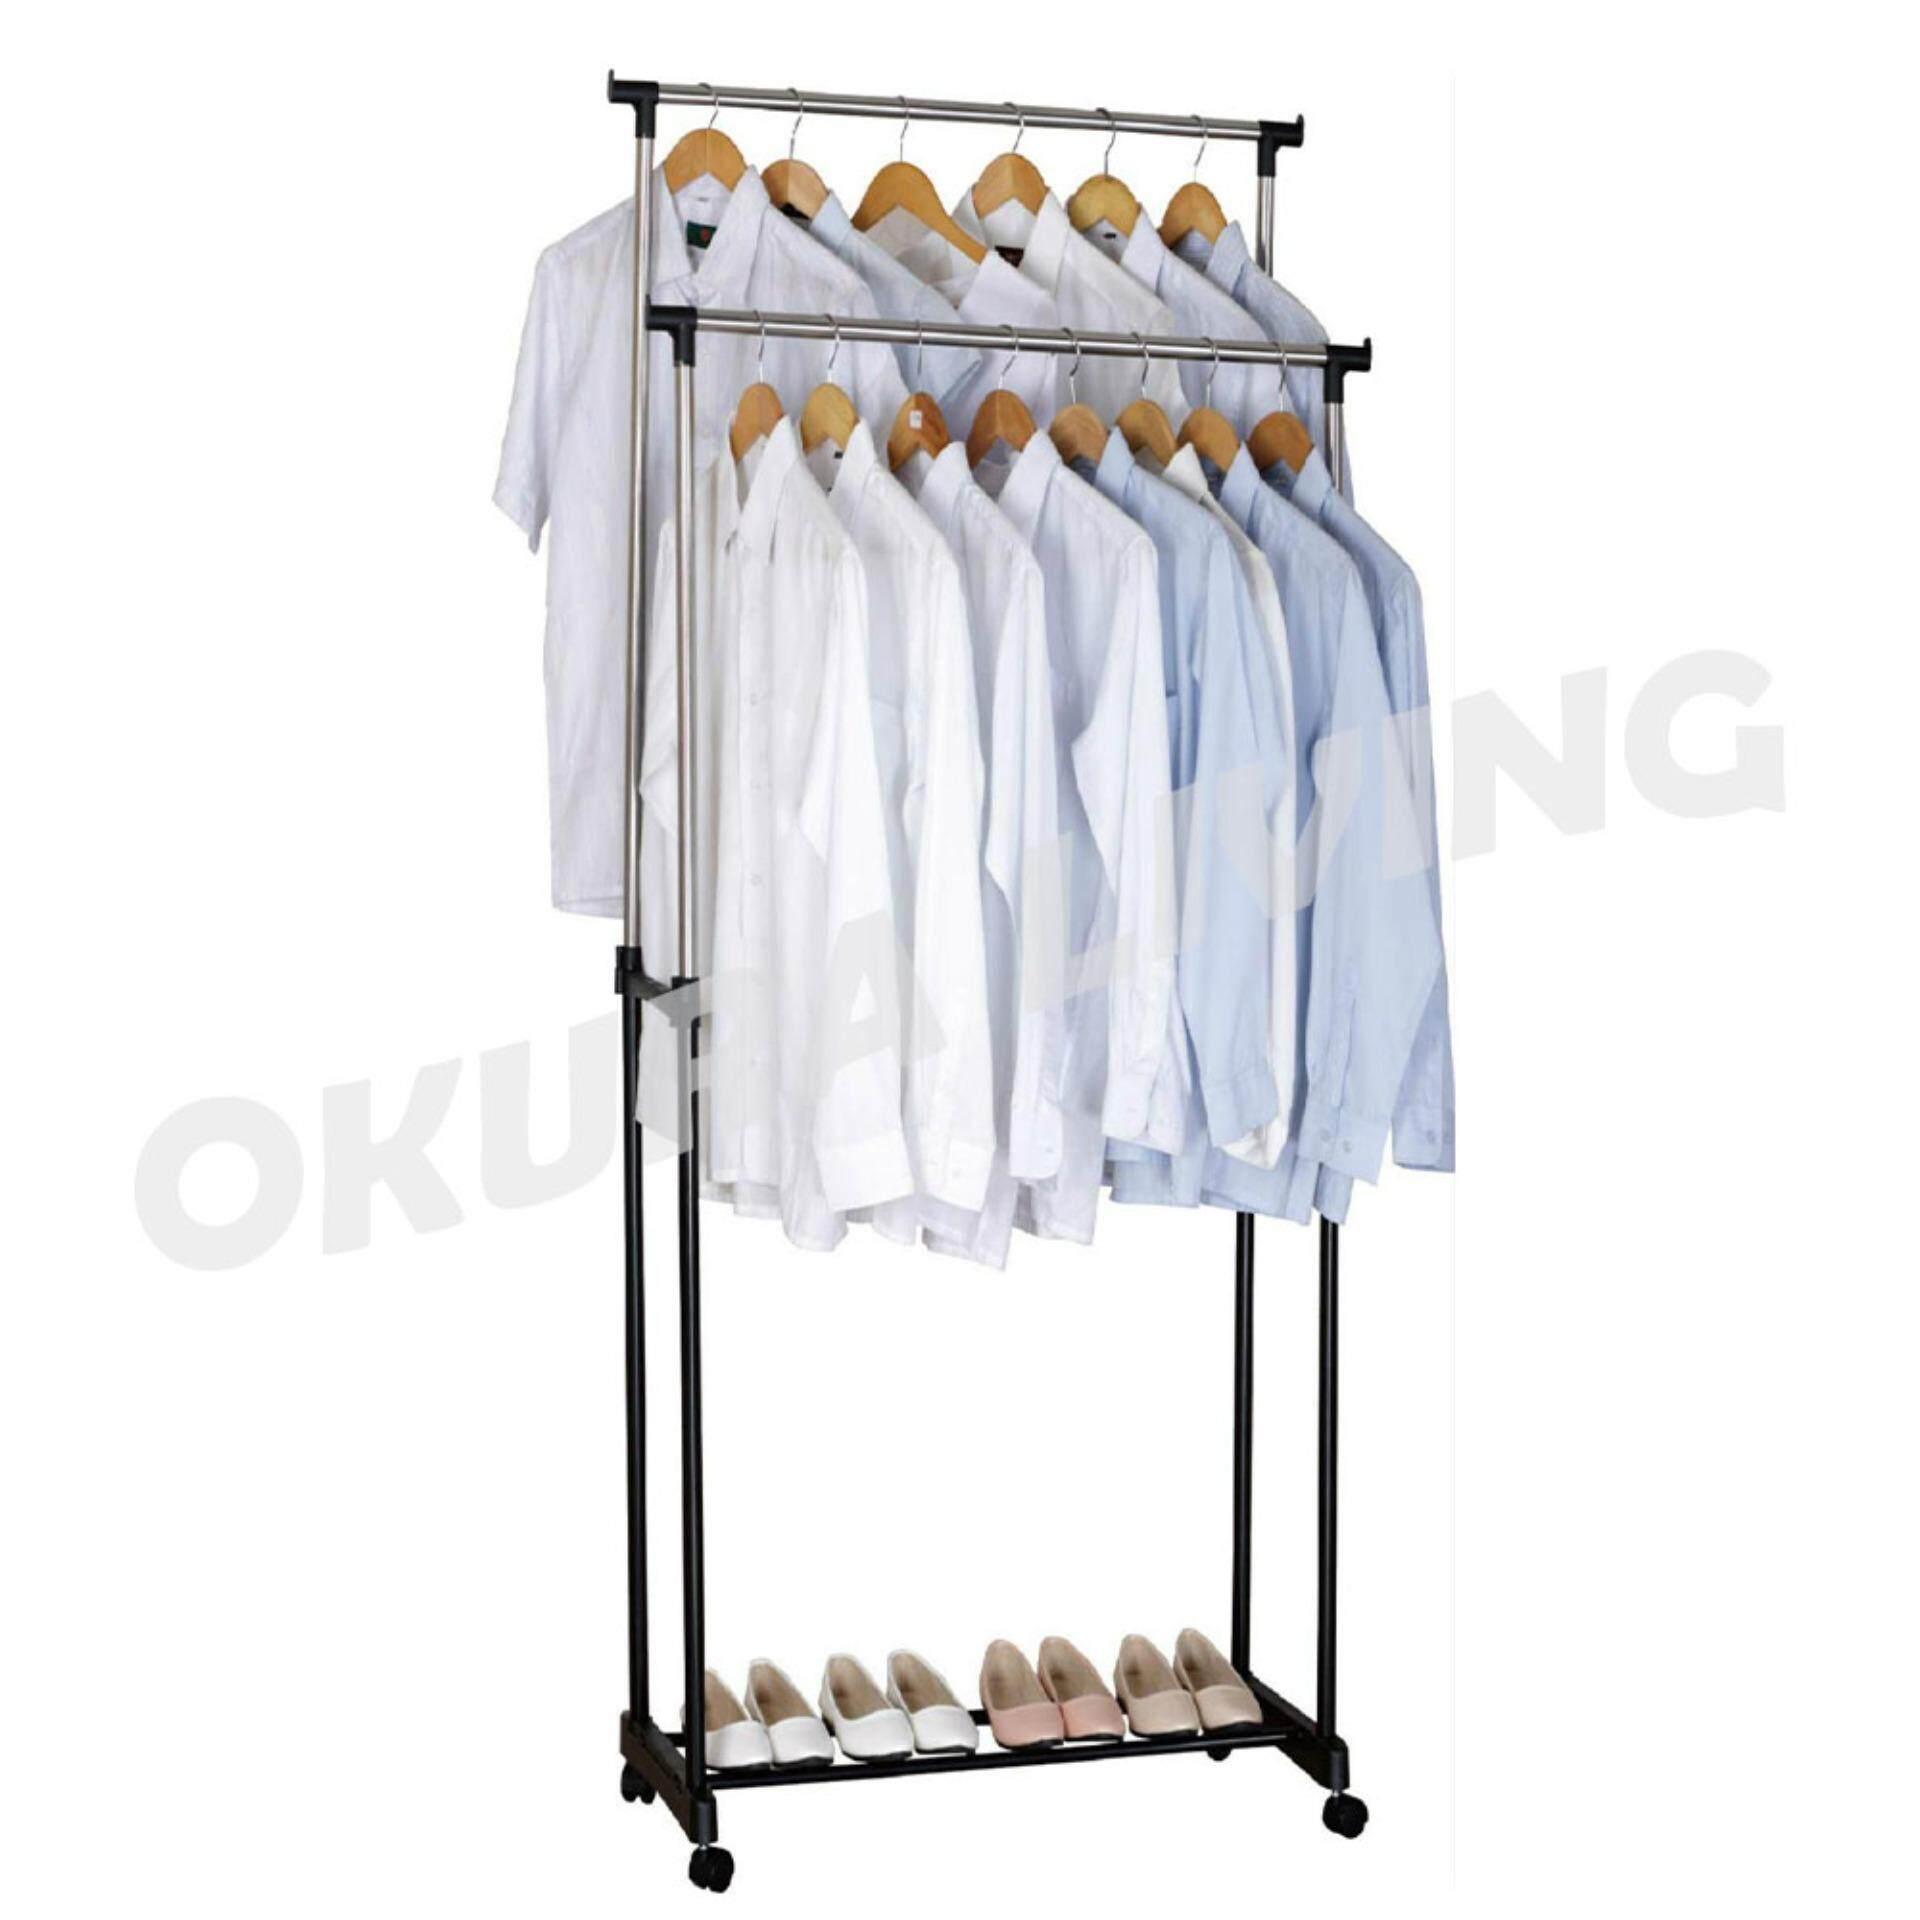 OKURA Adjustable Double Garment Cloth Hanger and Shoe Rack Steel Powder Coated